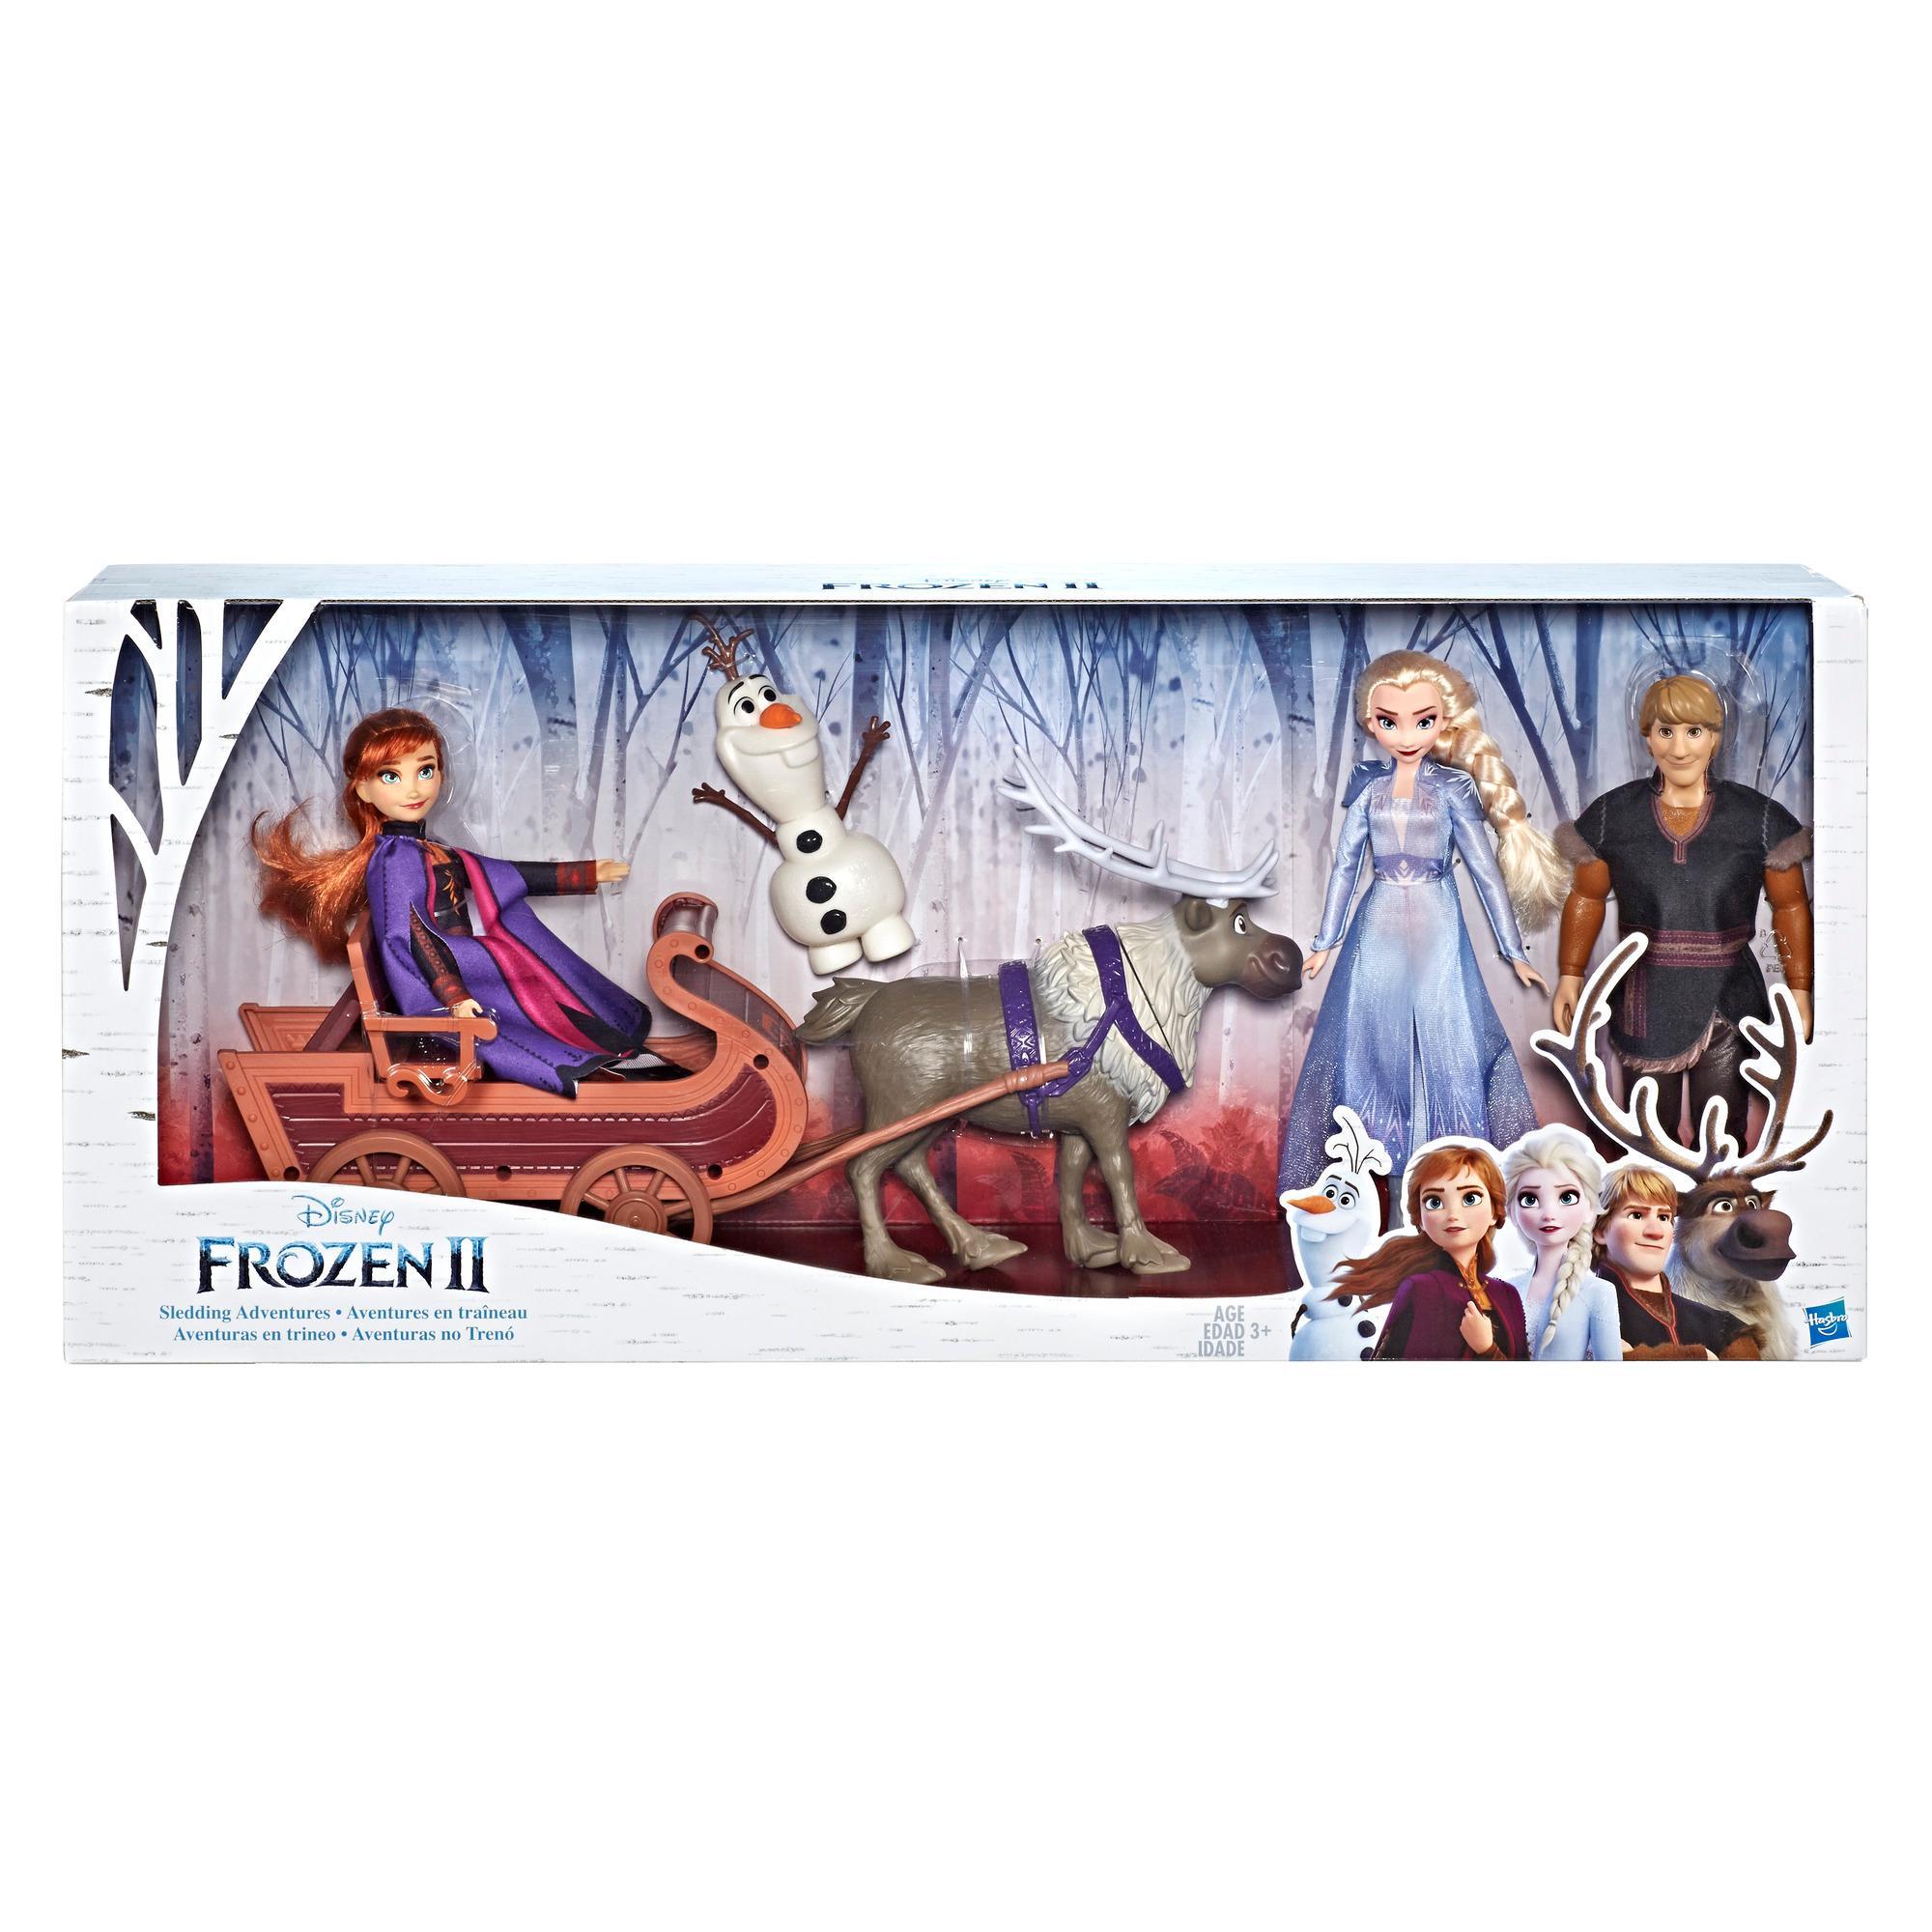 FROZEN Disney Frozen 2 Character Multipack With Sled hahmot + reki